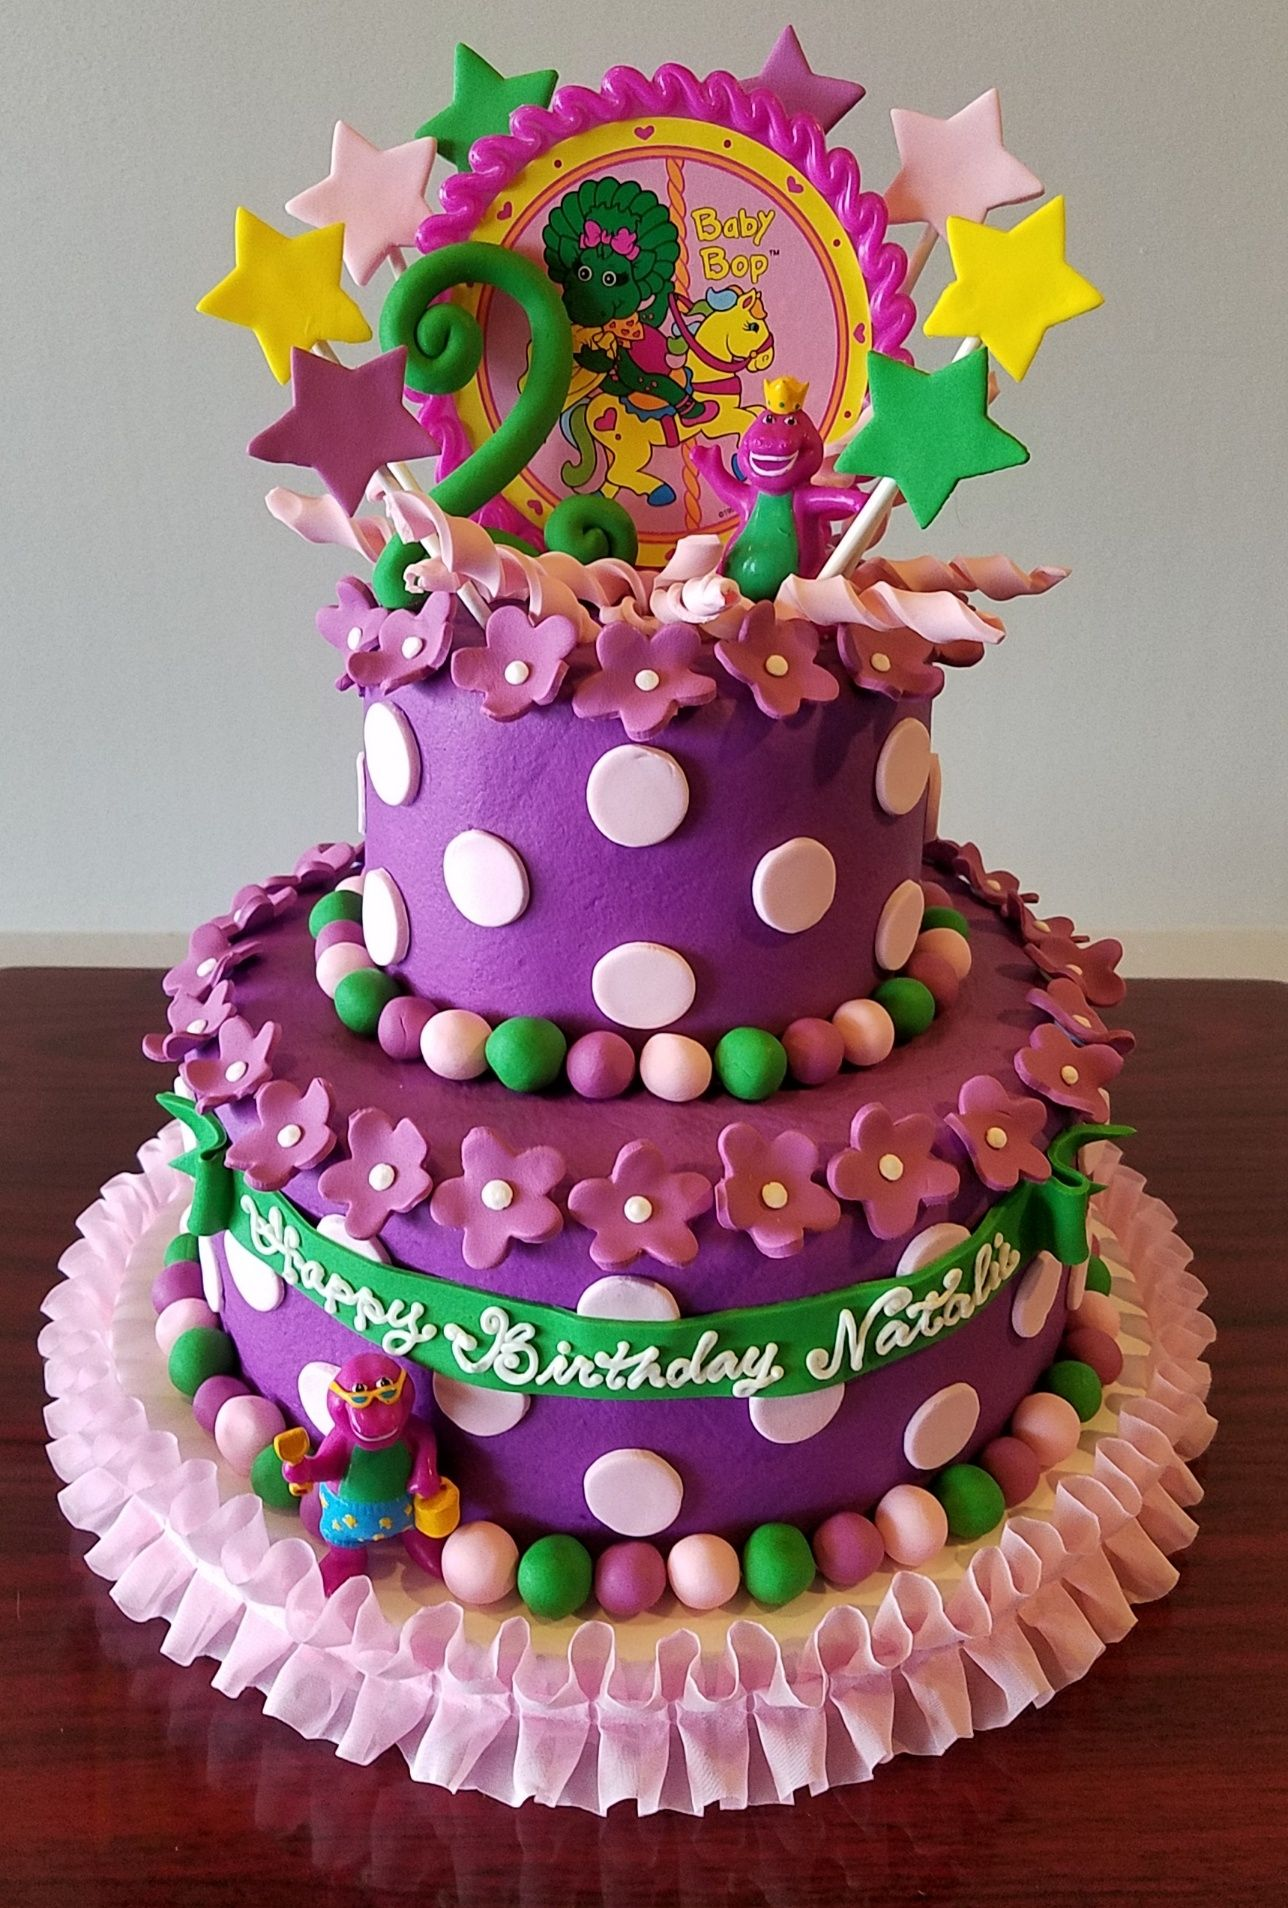 Barney Baby Bop Tiered Birthday Cake - Adrienne & Co. Bakery ...